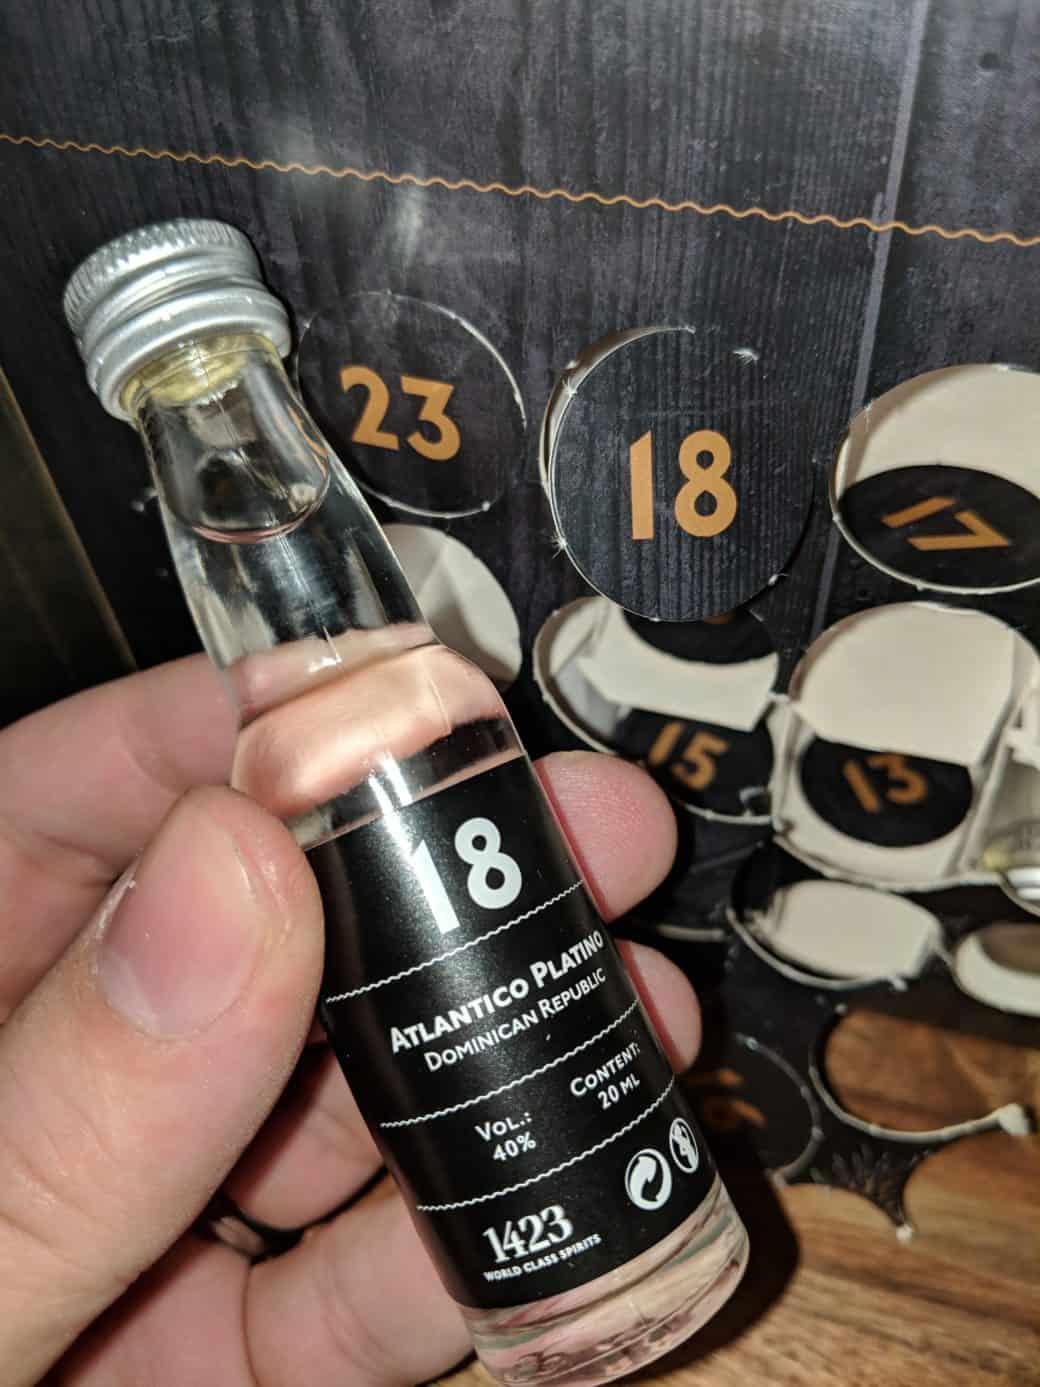 Degustační lahvinka Atlantico Platino